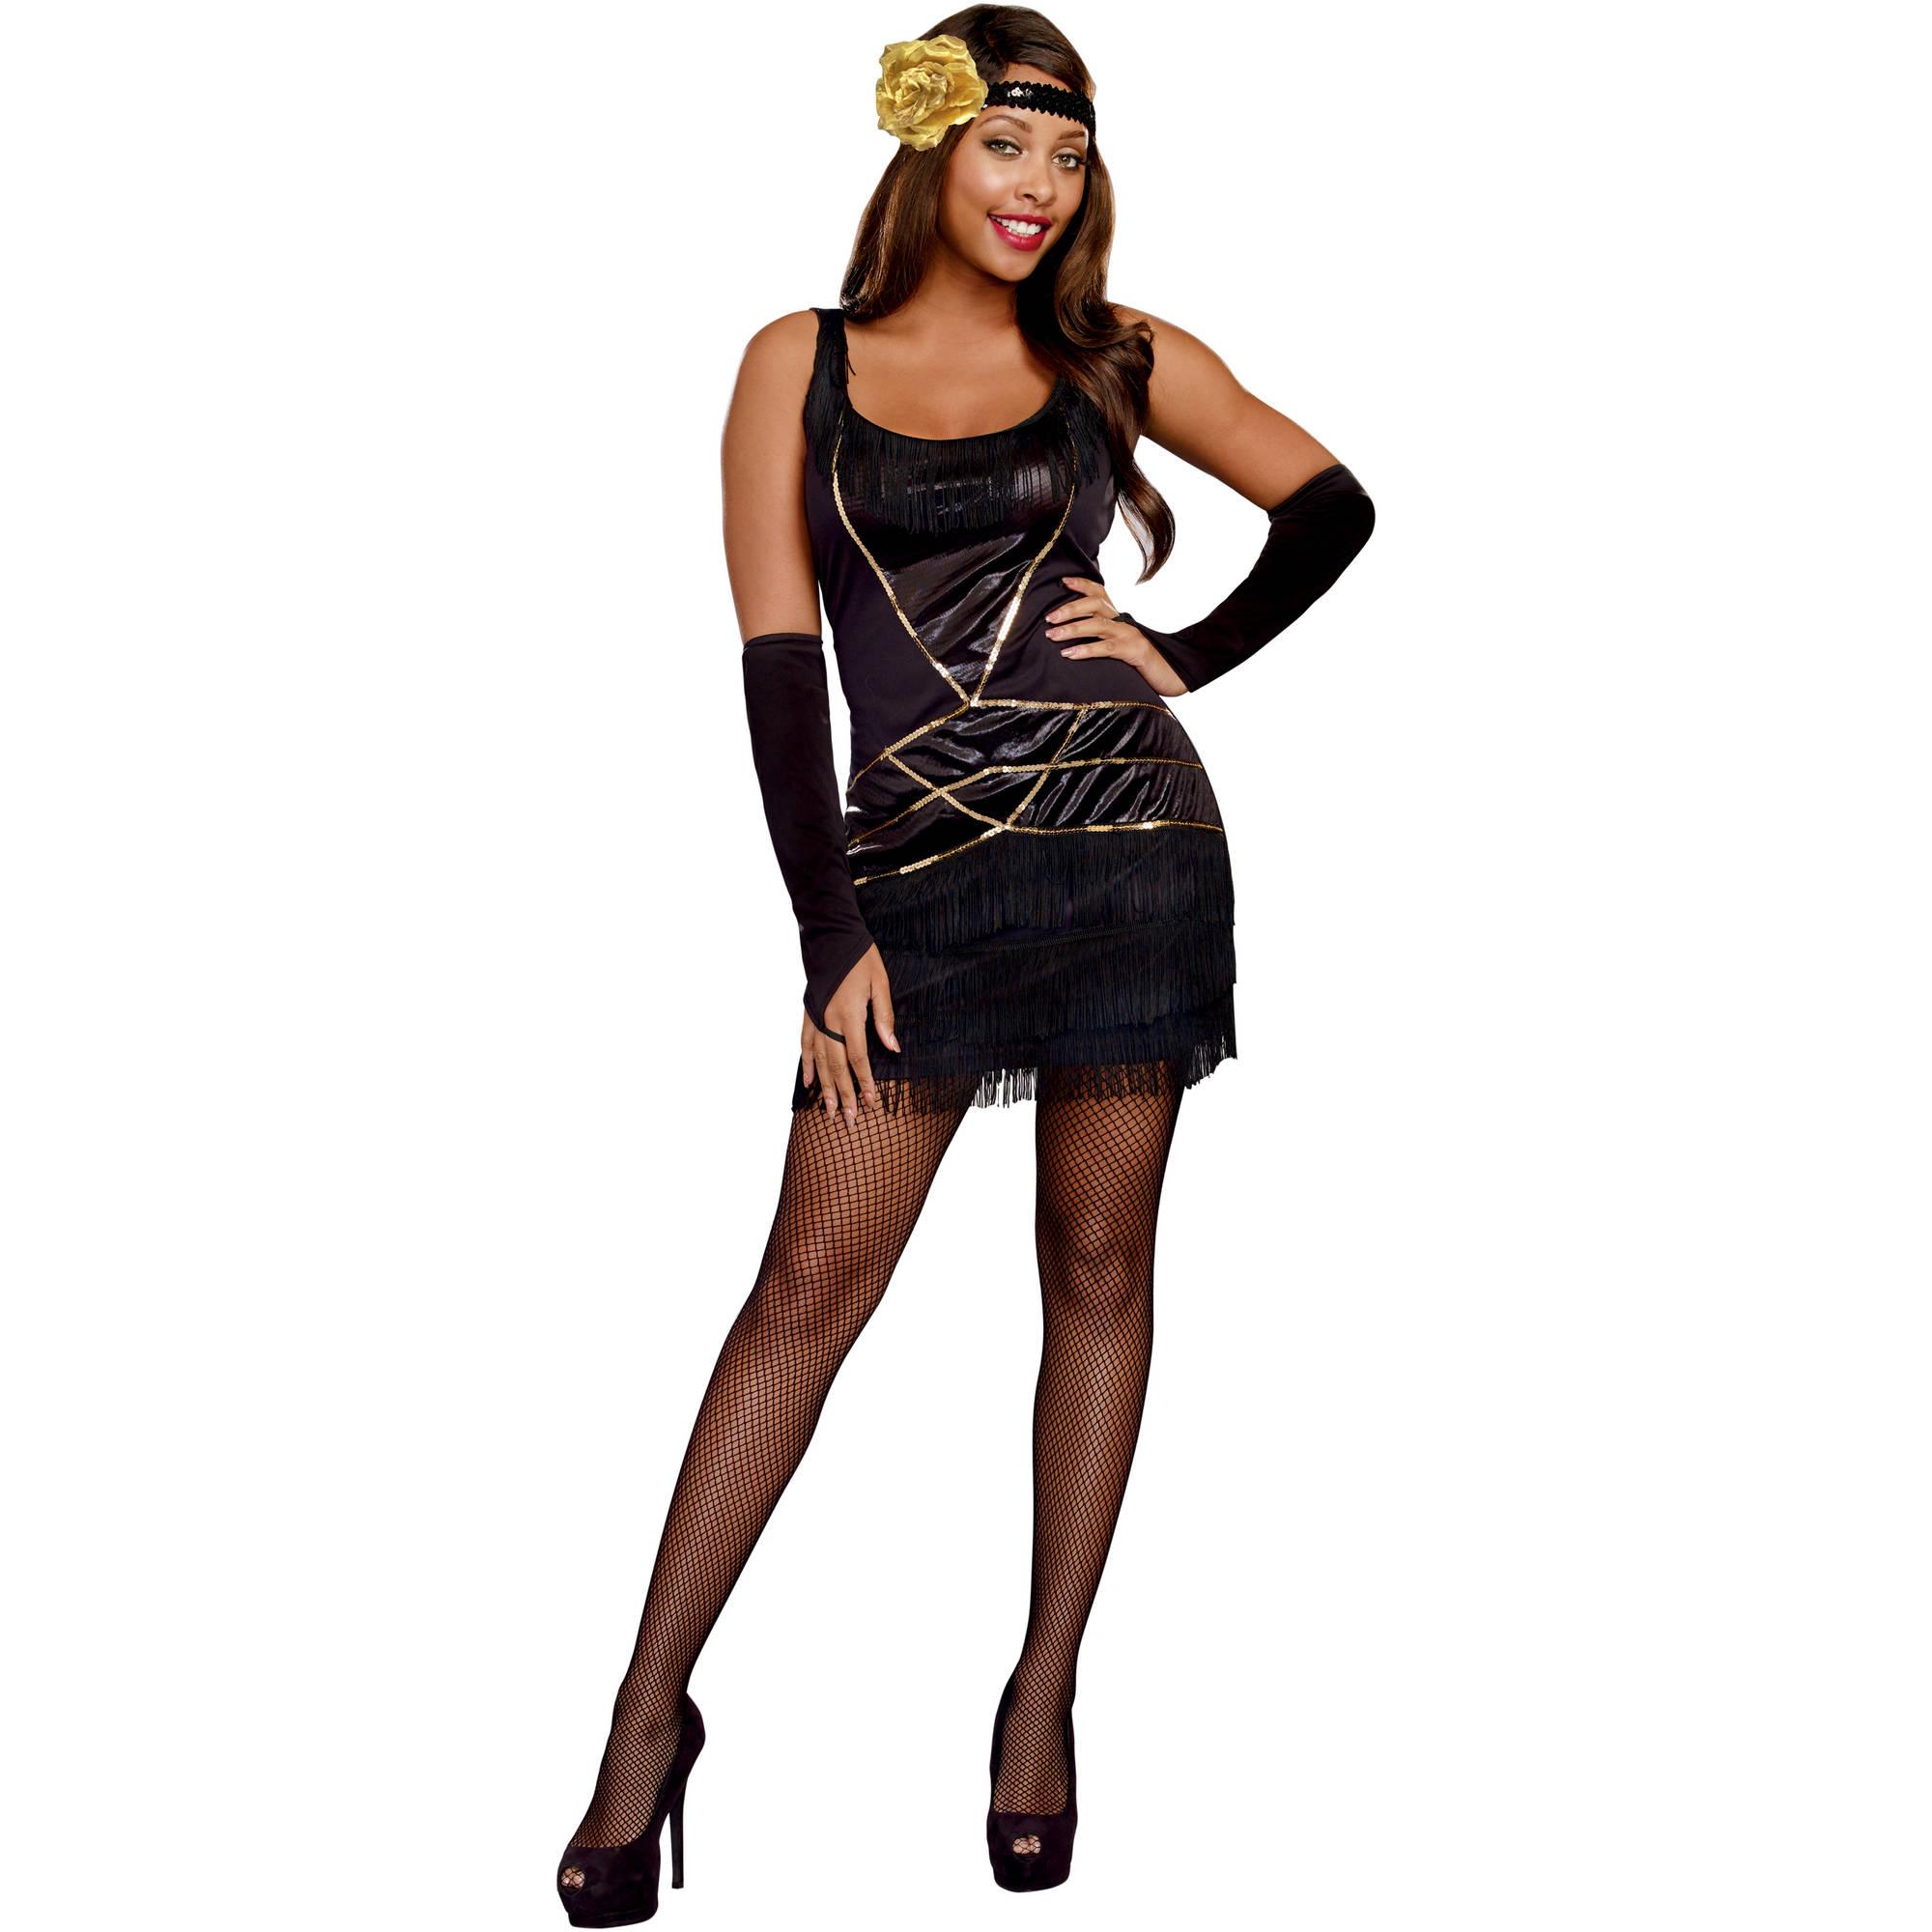 Miss Behavin' Adult Women's Halloween Costume